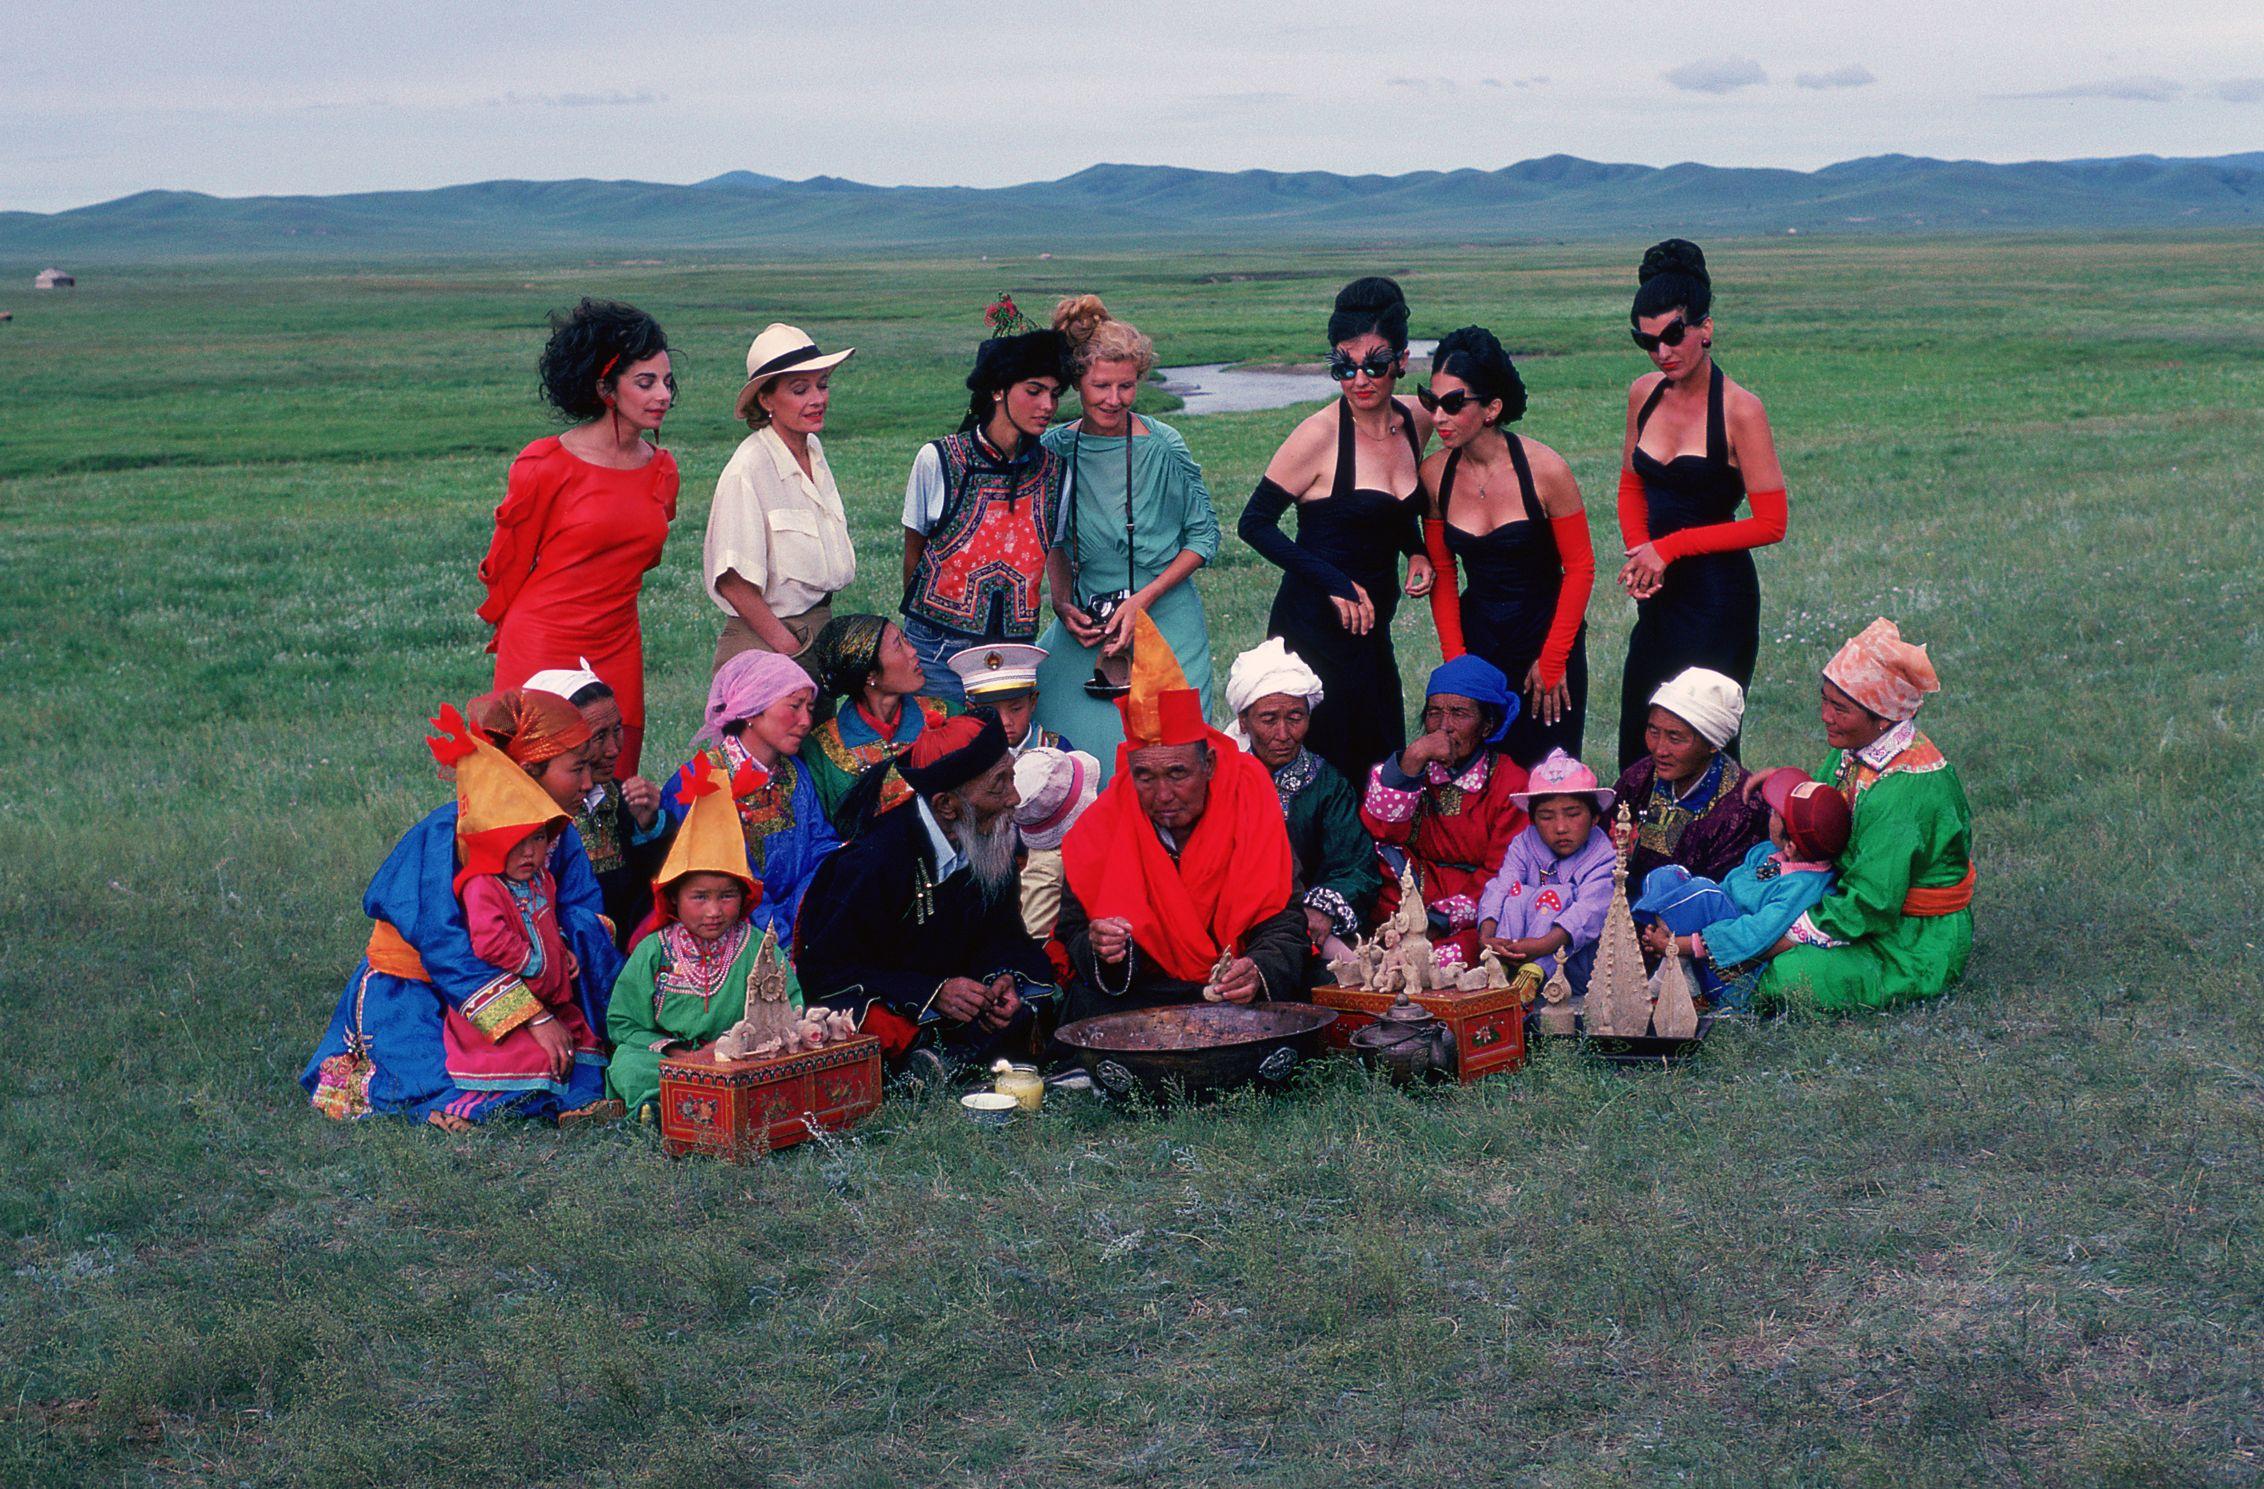 Ulrike Ottinger, Begegnung im Grasland, 1988. Colour photograph. Context: Johanna d'Arc of Mongolia, Altan Gol, Mongolia. Courtesy of the artist / Ulrike Ottinger Filmproduktion